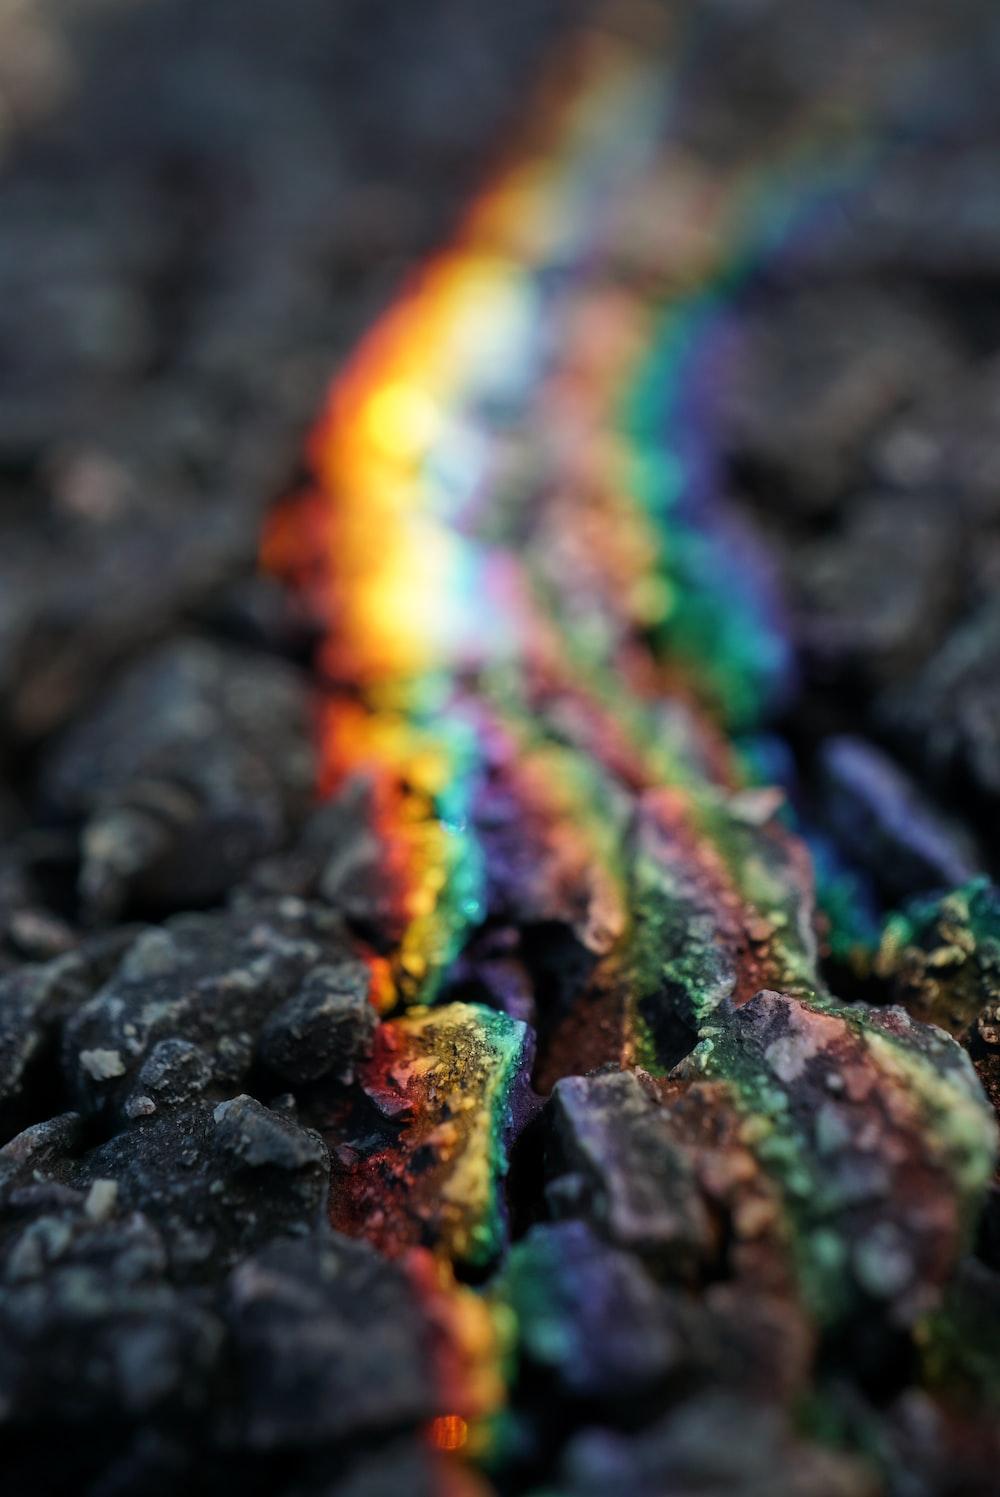 rainbow-colored stone